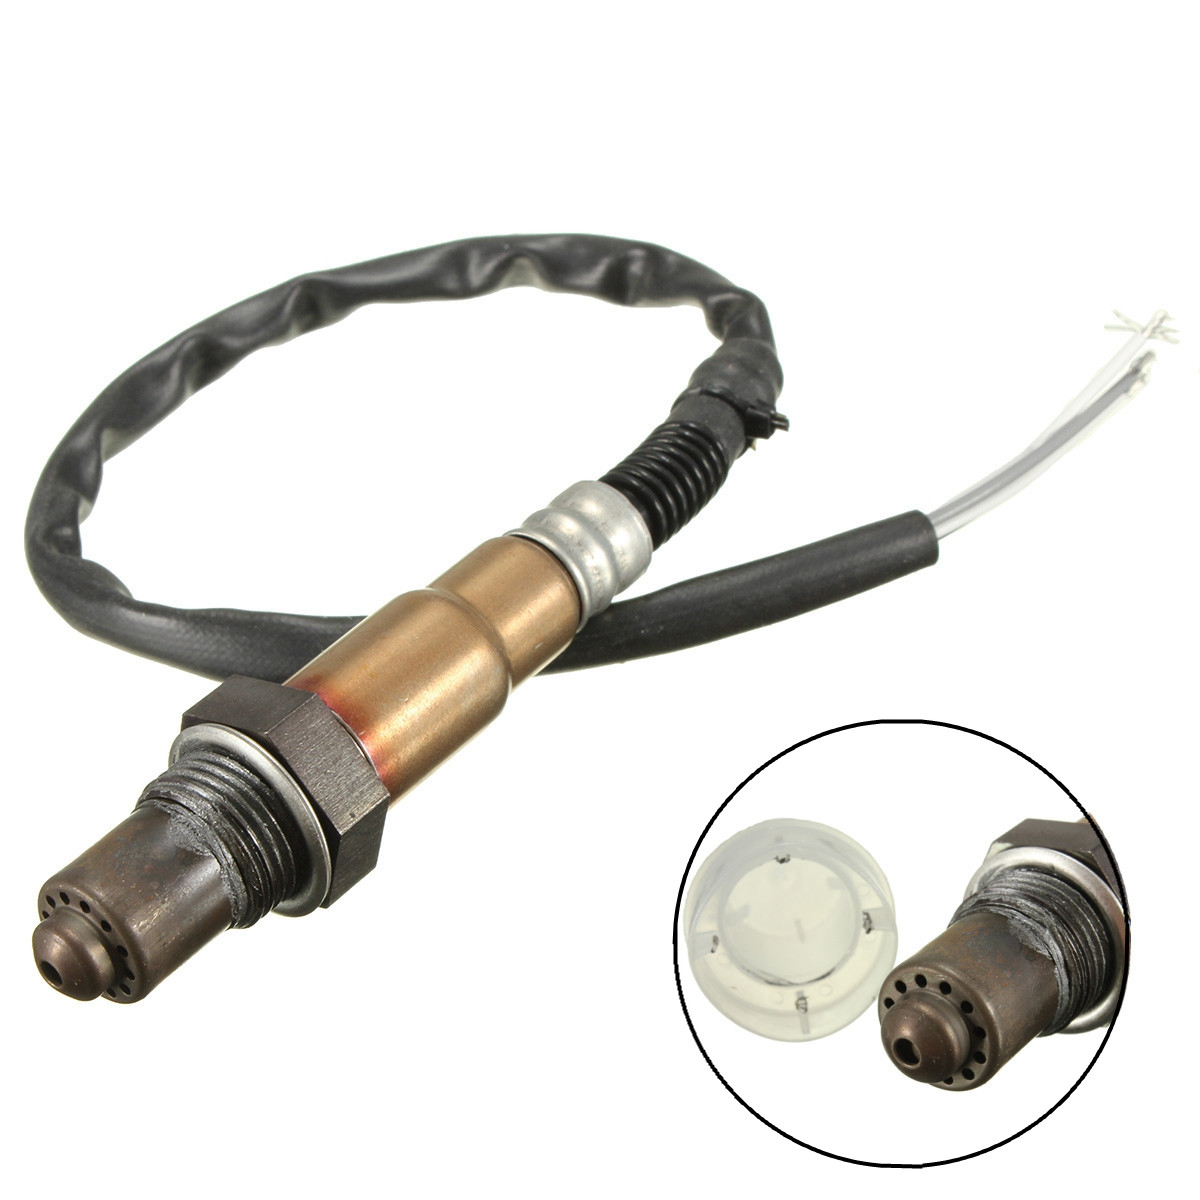 цена 4 Wire Universal O2 Oxygen Sensor For Citroen For Ford /Hyundai Renault Volvo /VW /Lambda O2 Sensor 0258986602